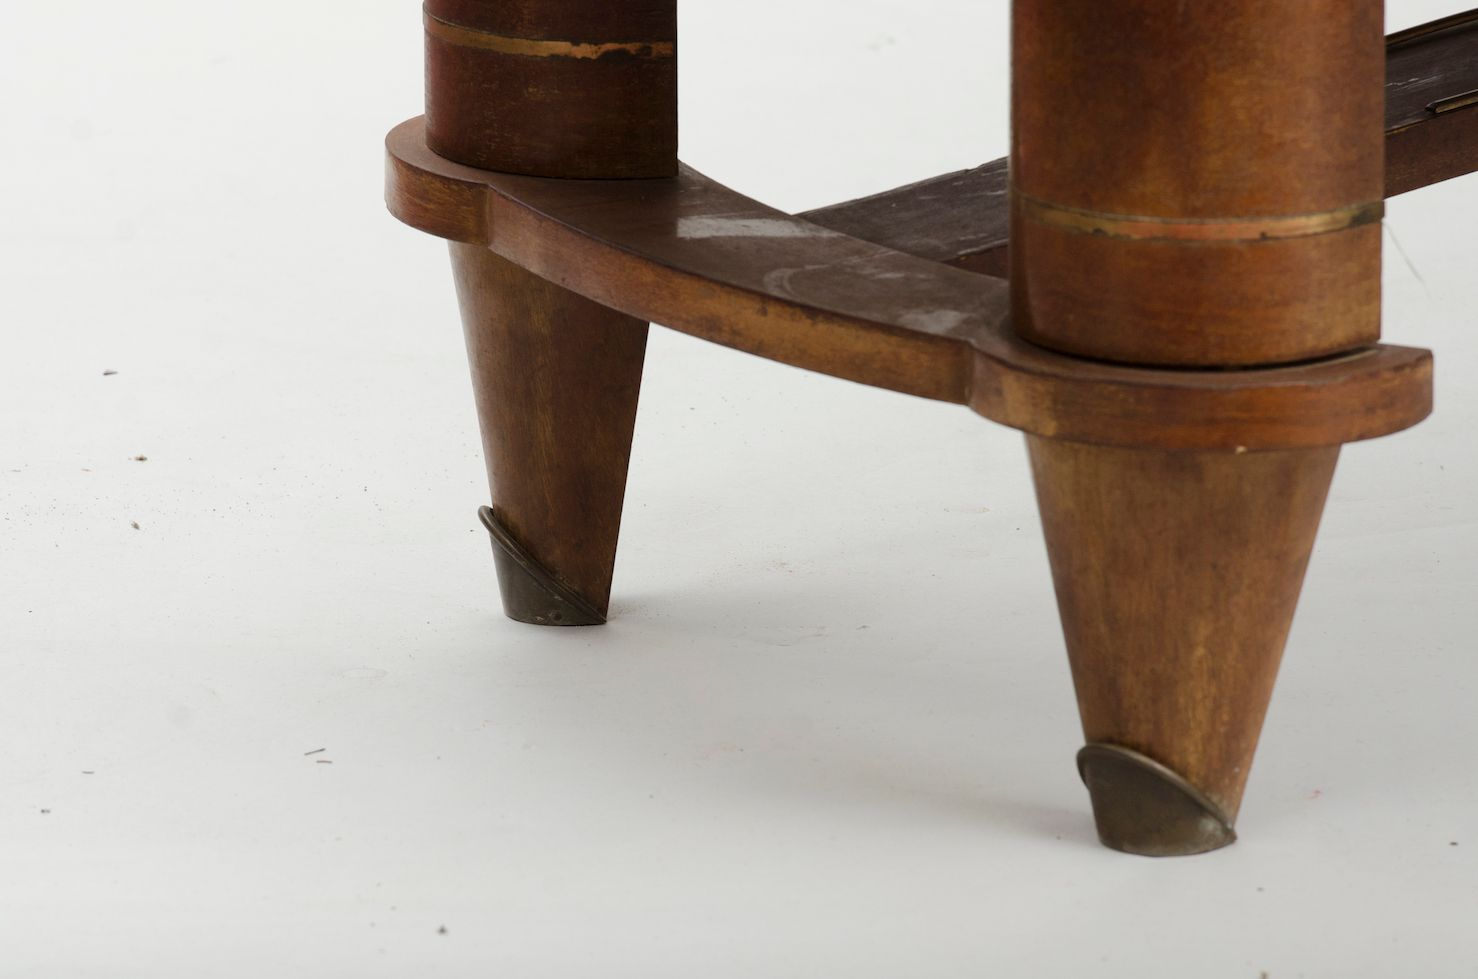 Vintage Mahogany Veneered Art Deco Dining Table for sale  : vintage mahogany veneered art deco dining table 4 from www.pamono.com size 1478 x 979 jpeg 581kB